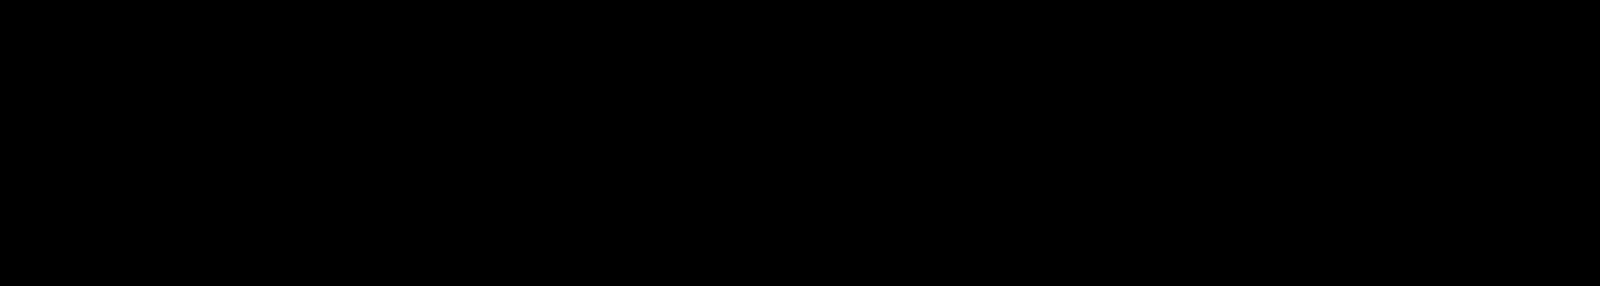 La marca maurice lacroix en España